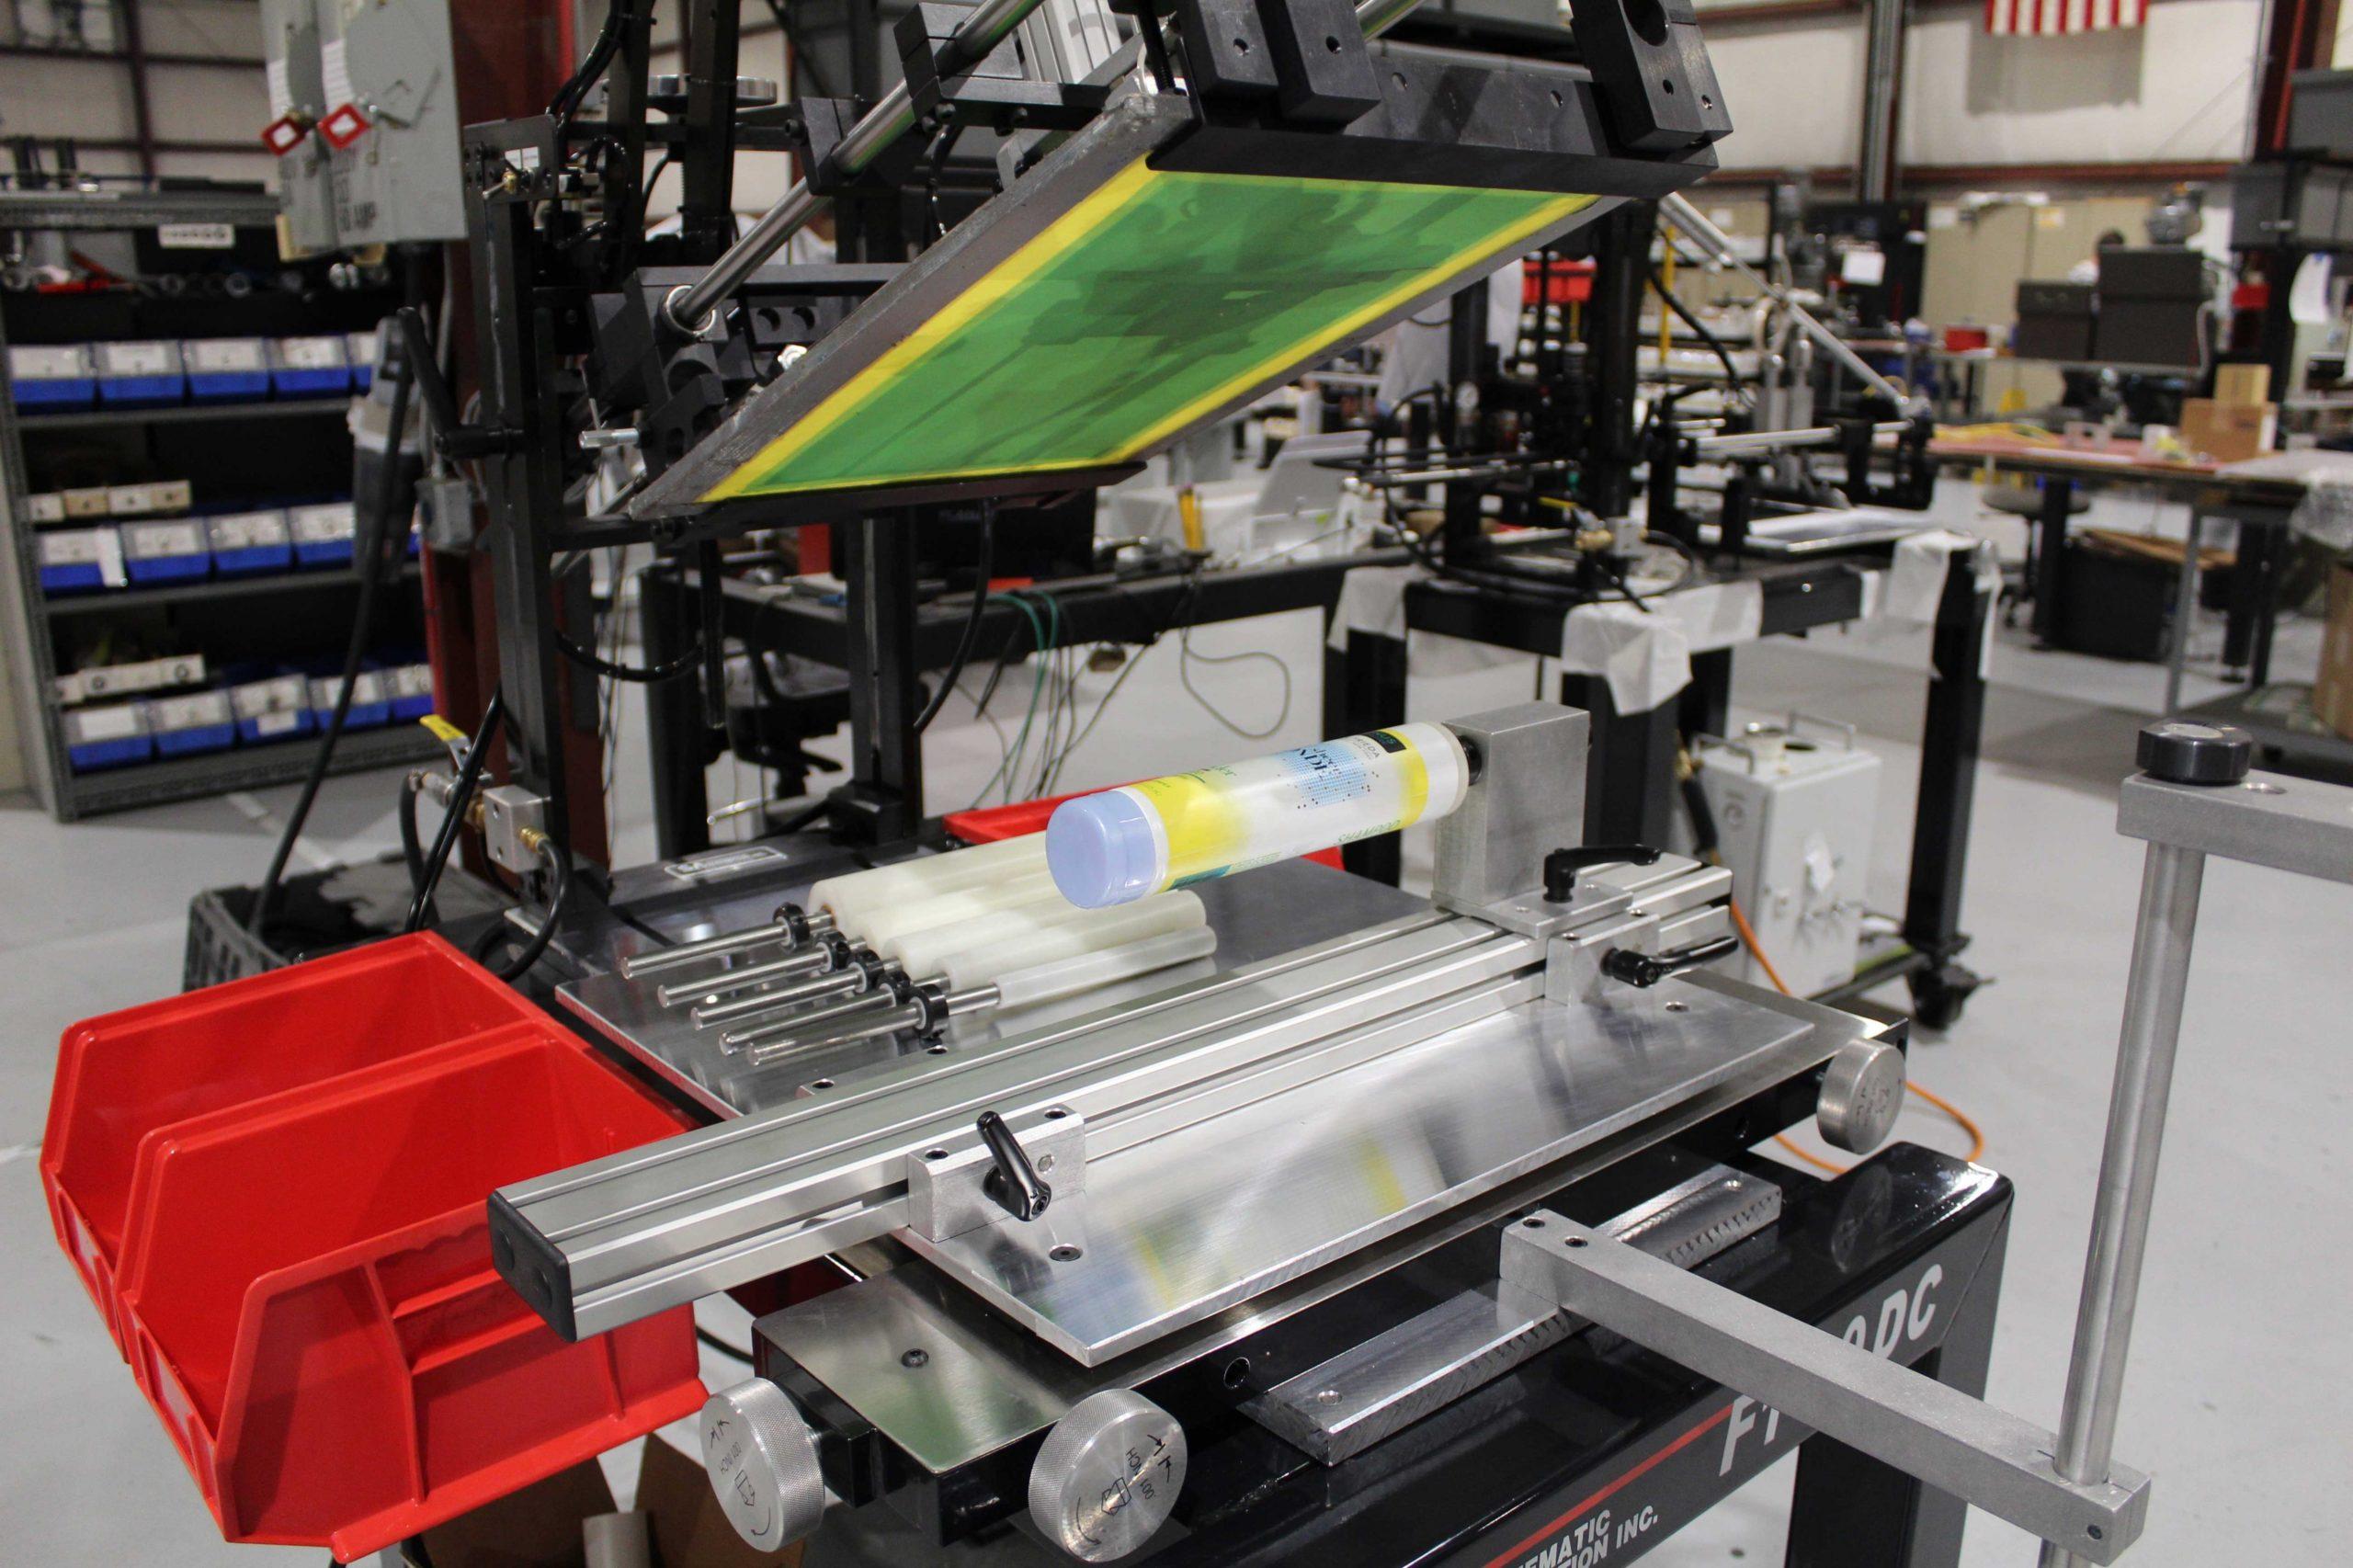 Model-F1-DC-Bottle-Screen-Printer-scaled